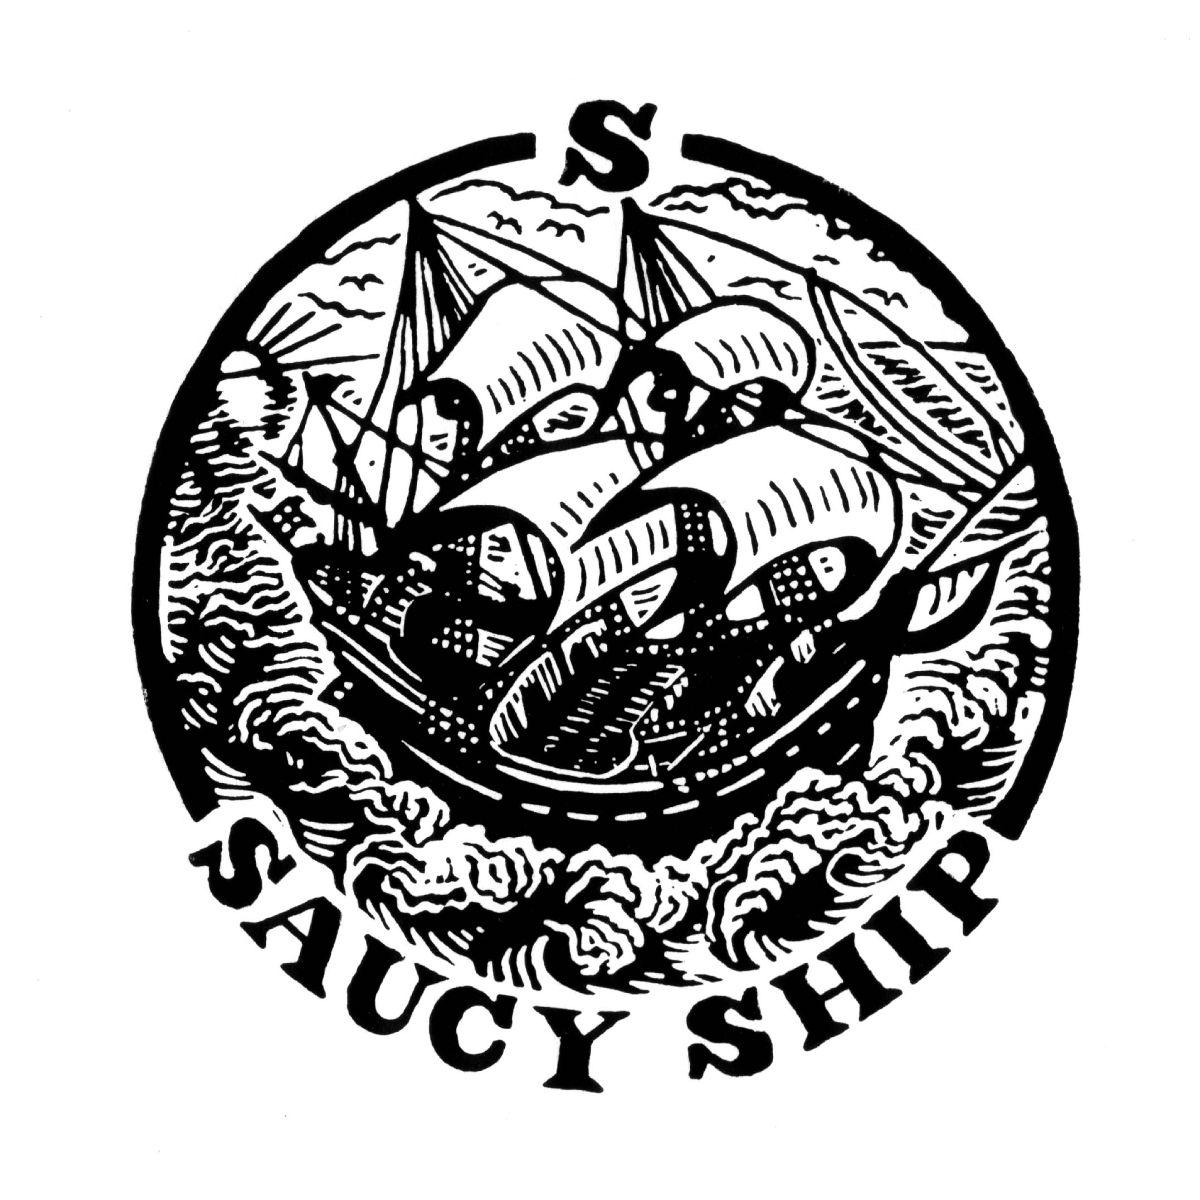 Saucy ship